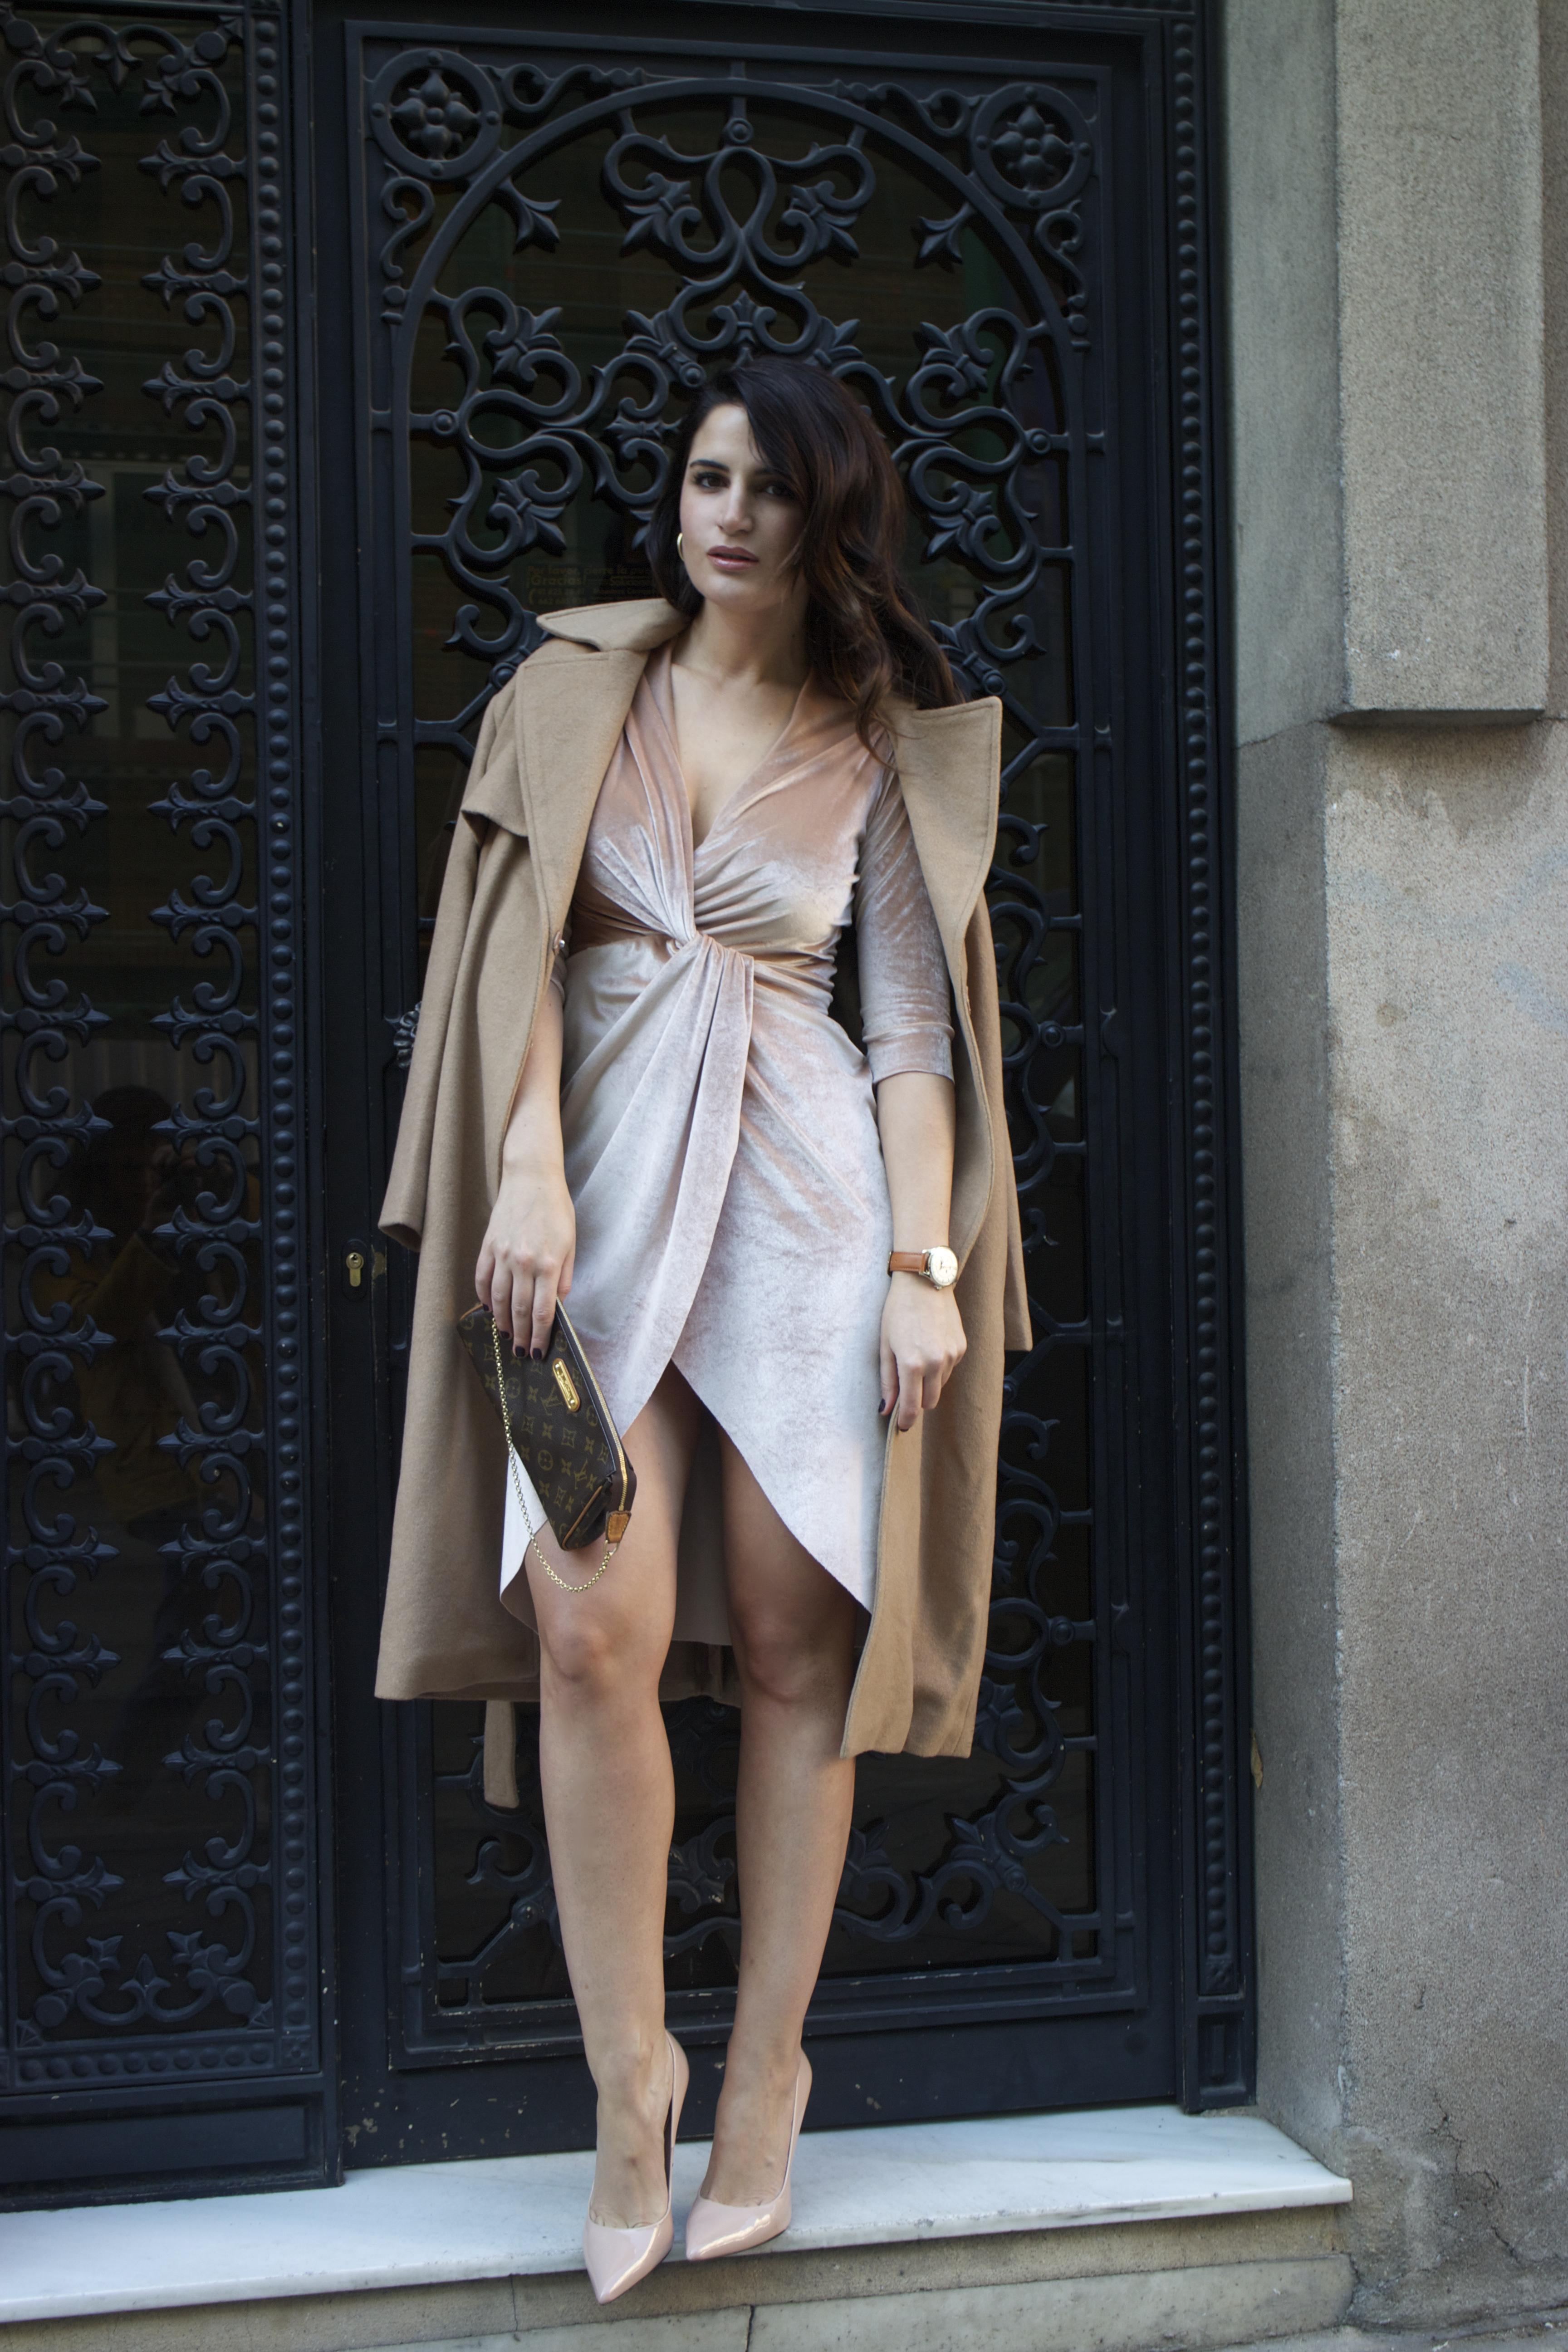 henry-london-watch-brand-embassador-pink-velvet-dress-vuitton-bag-lady-amaras-la-moda-paula-fraile6